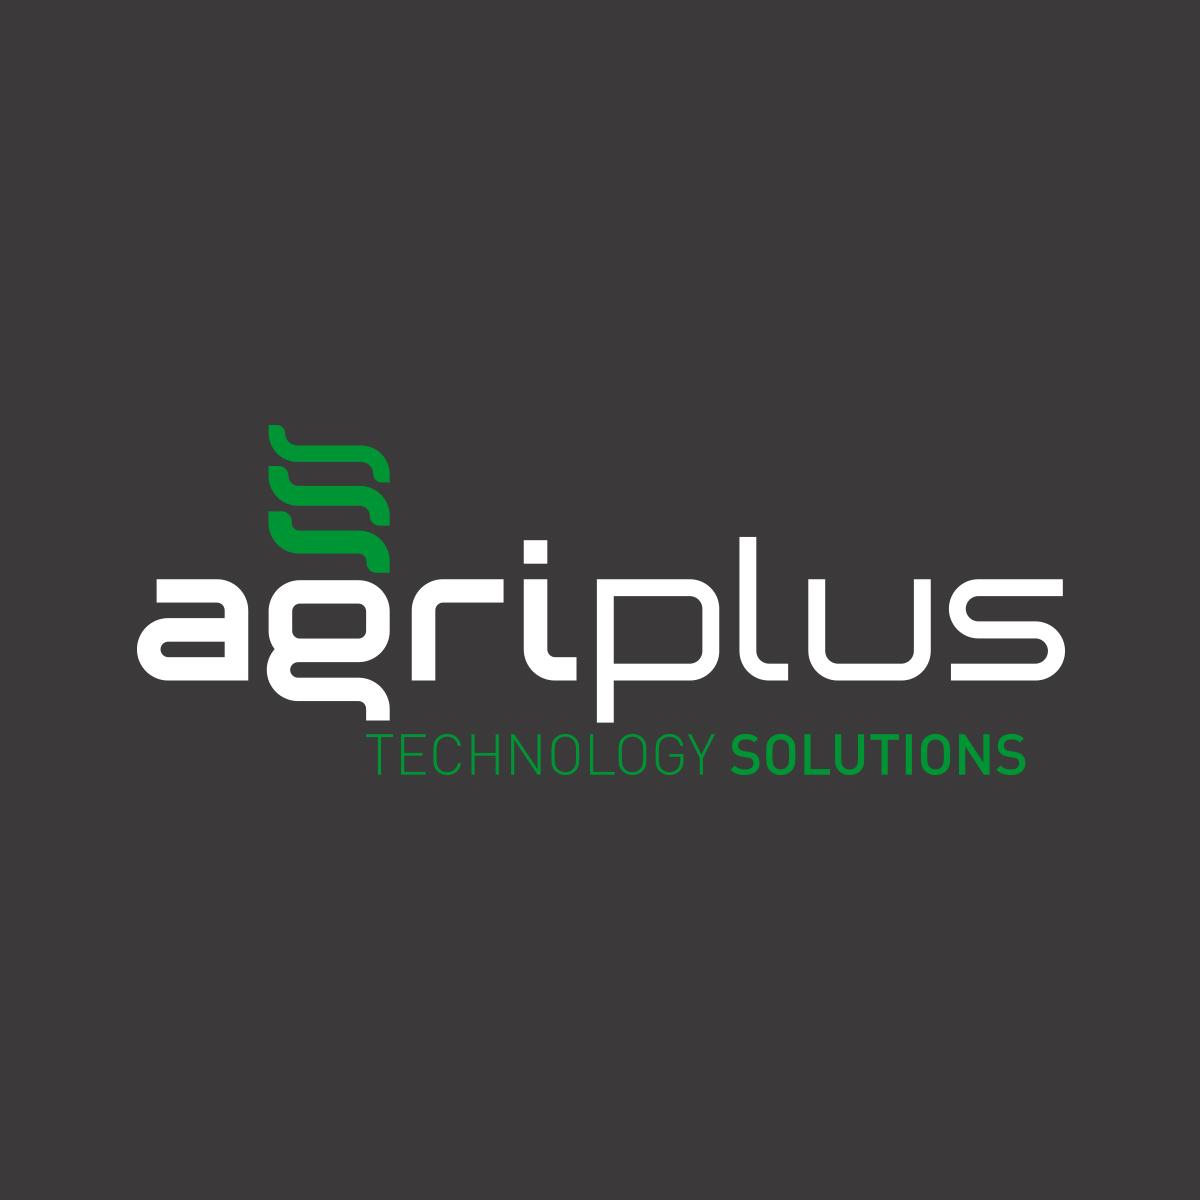 agriplus